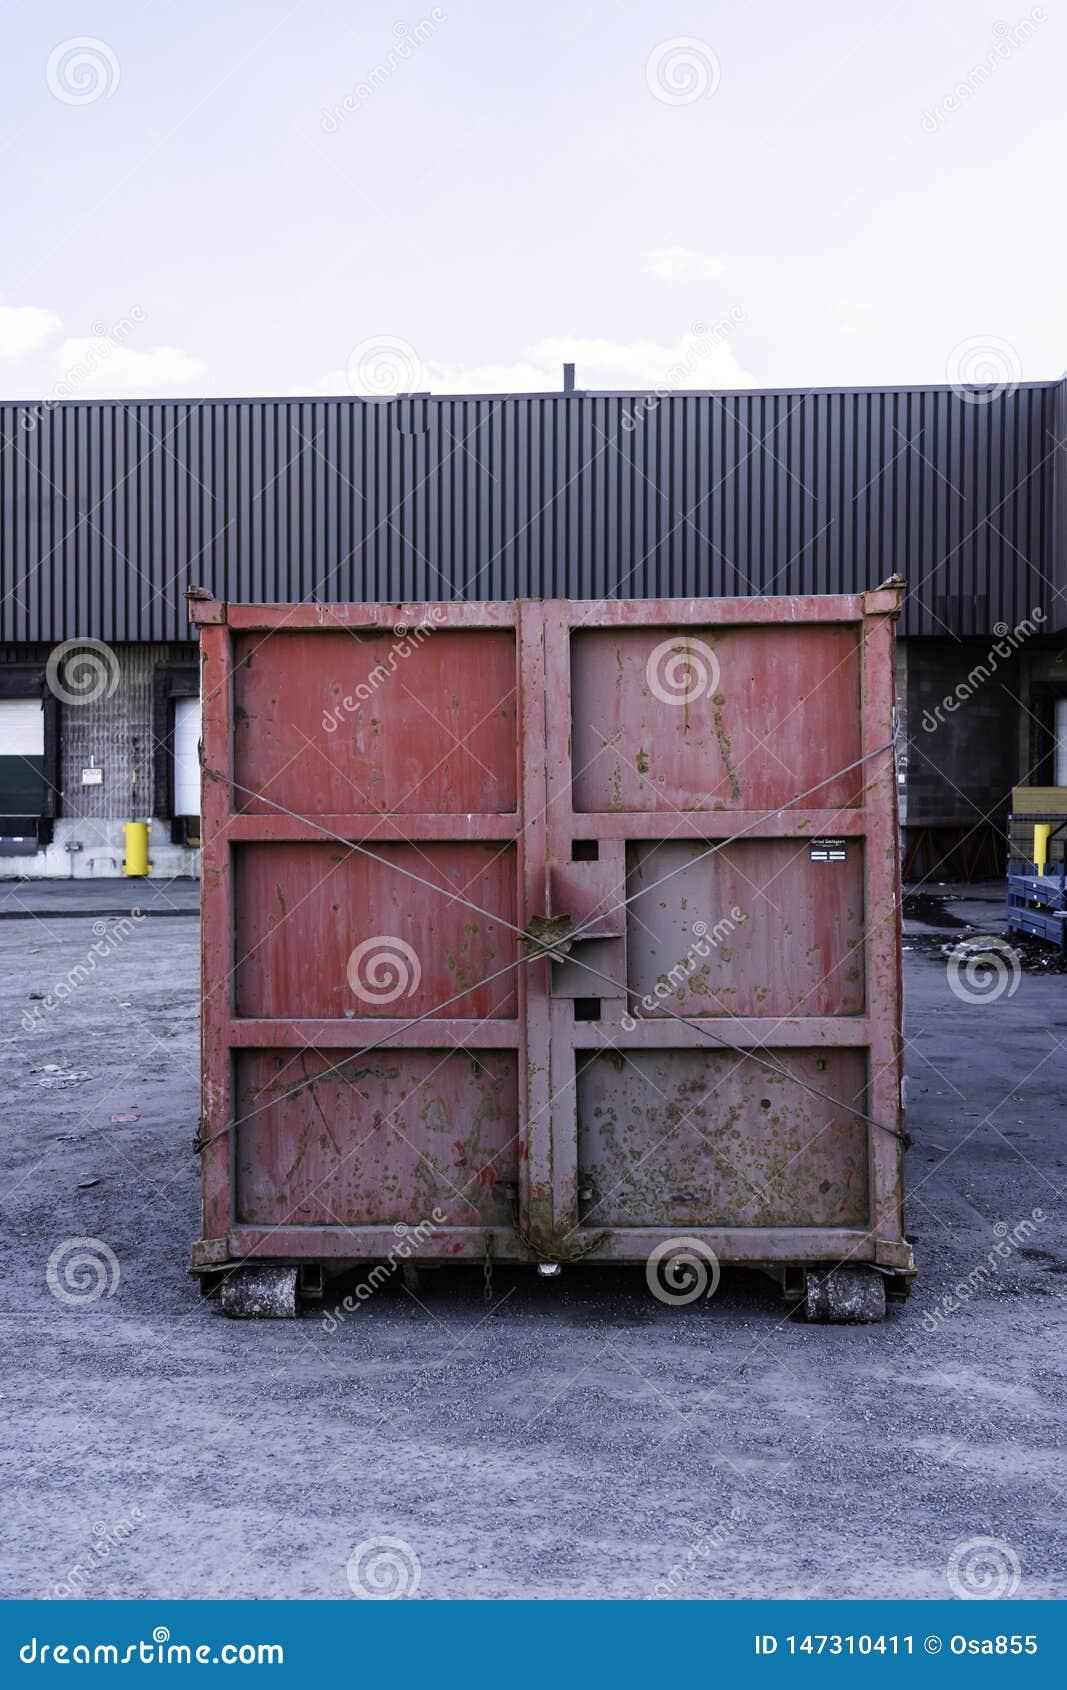 Escaninho dos desperd?cios do recipiente dos restos para depositar desperd?cios e material da renova??o da casa